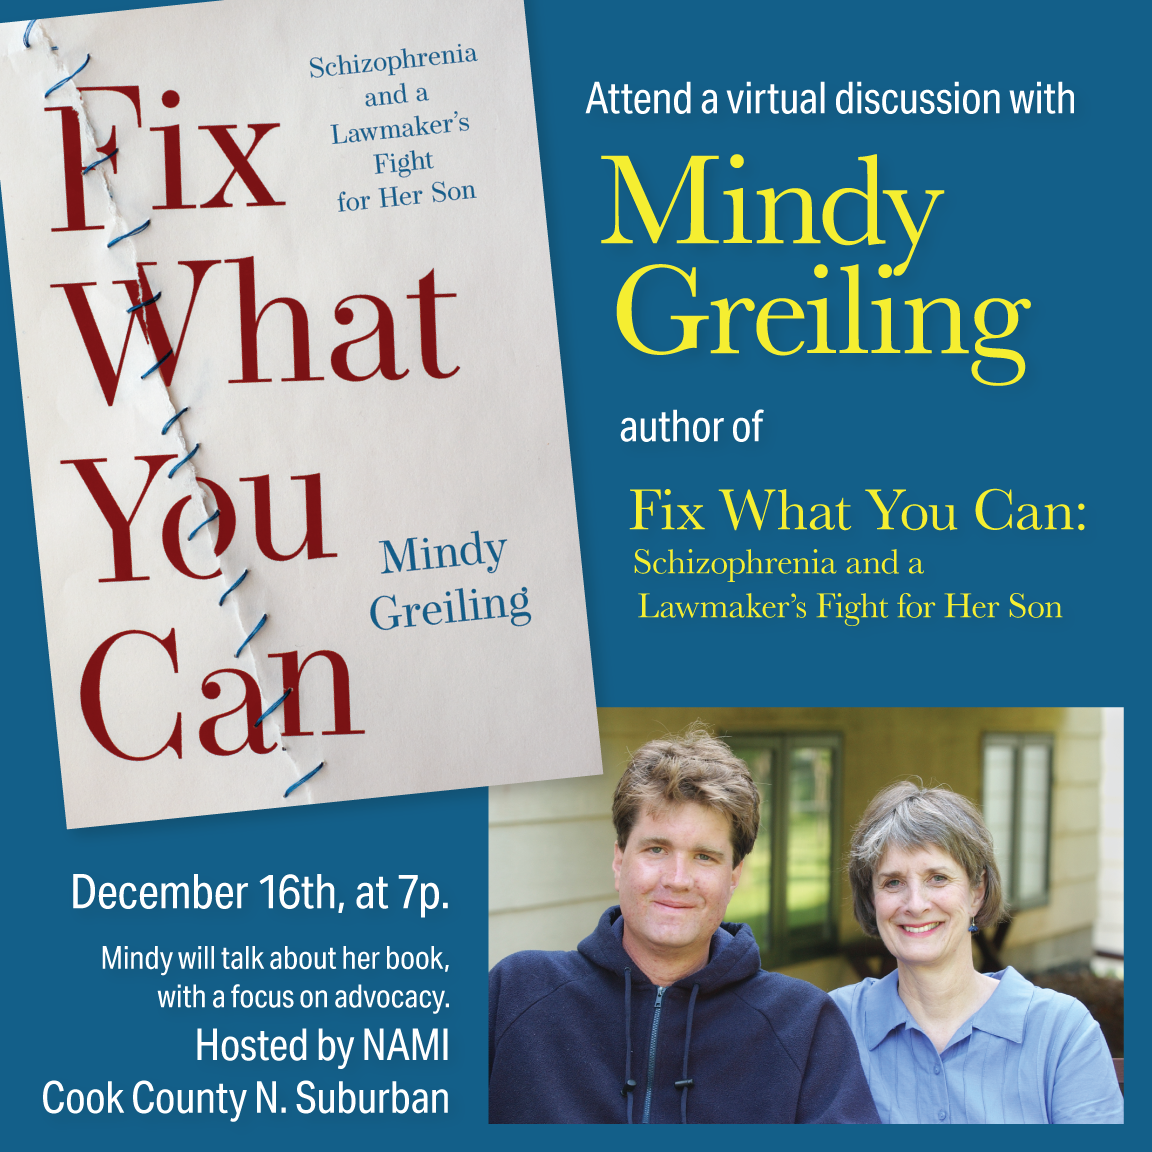 Mindy Greiling's memoir